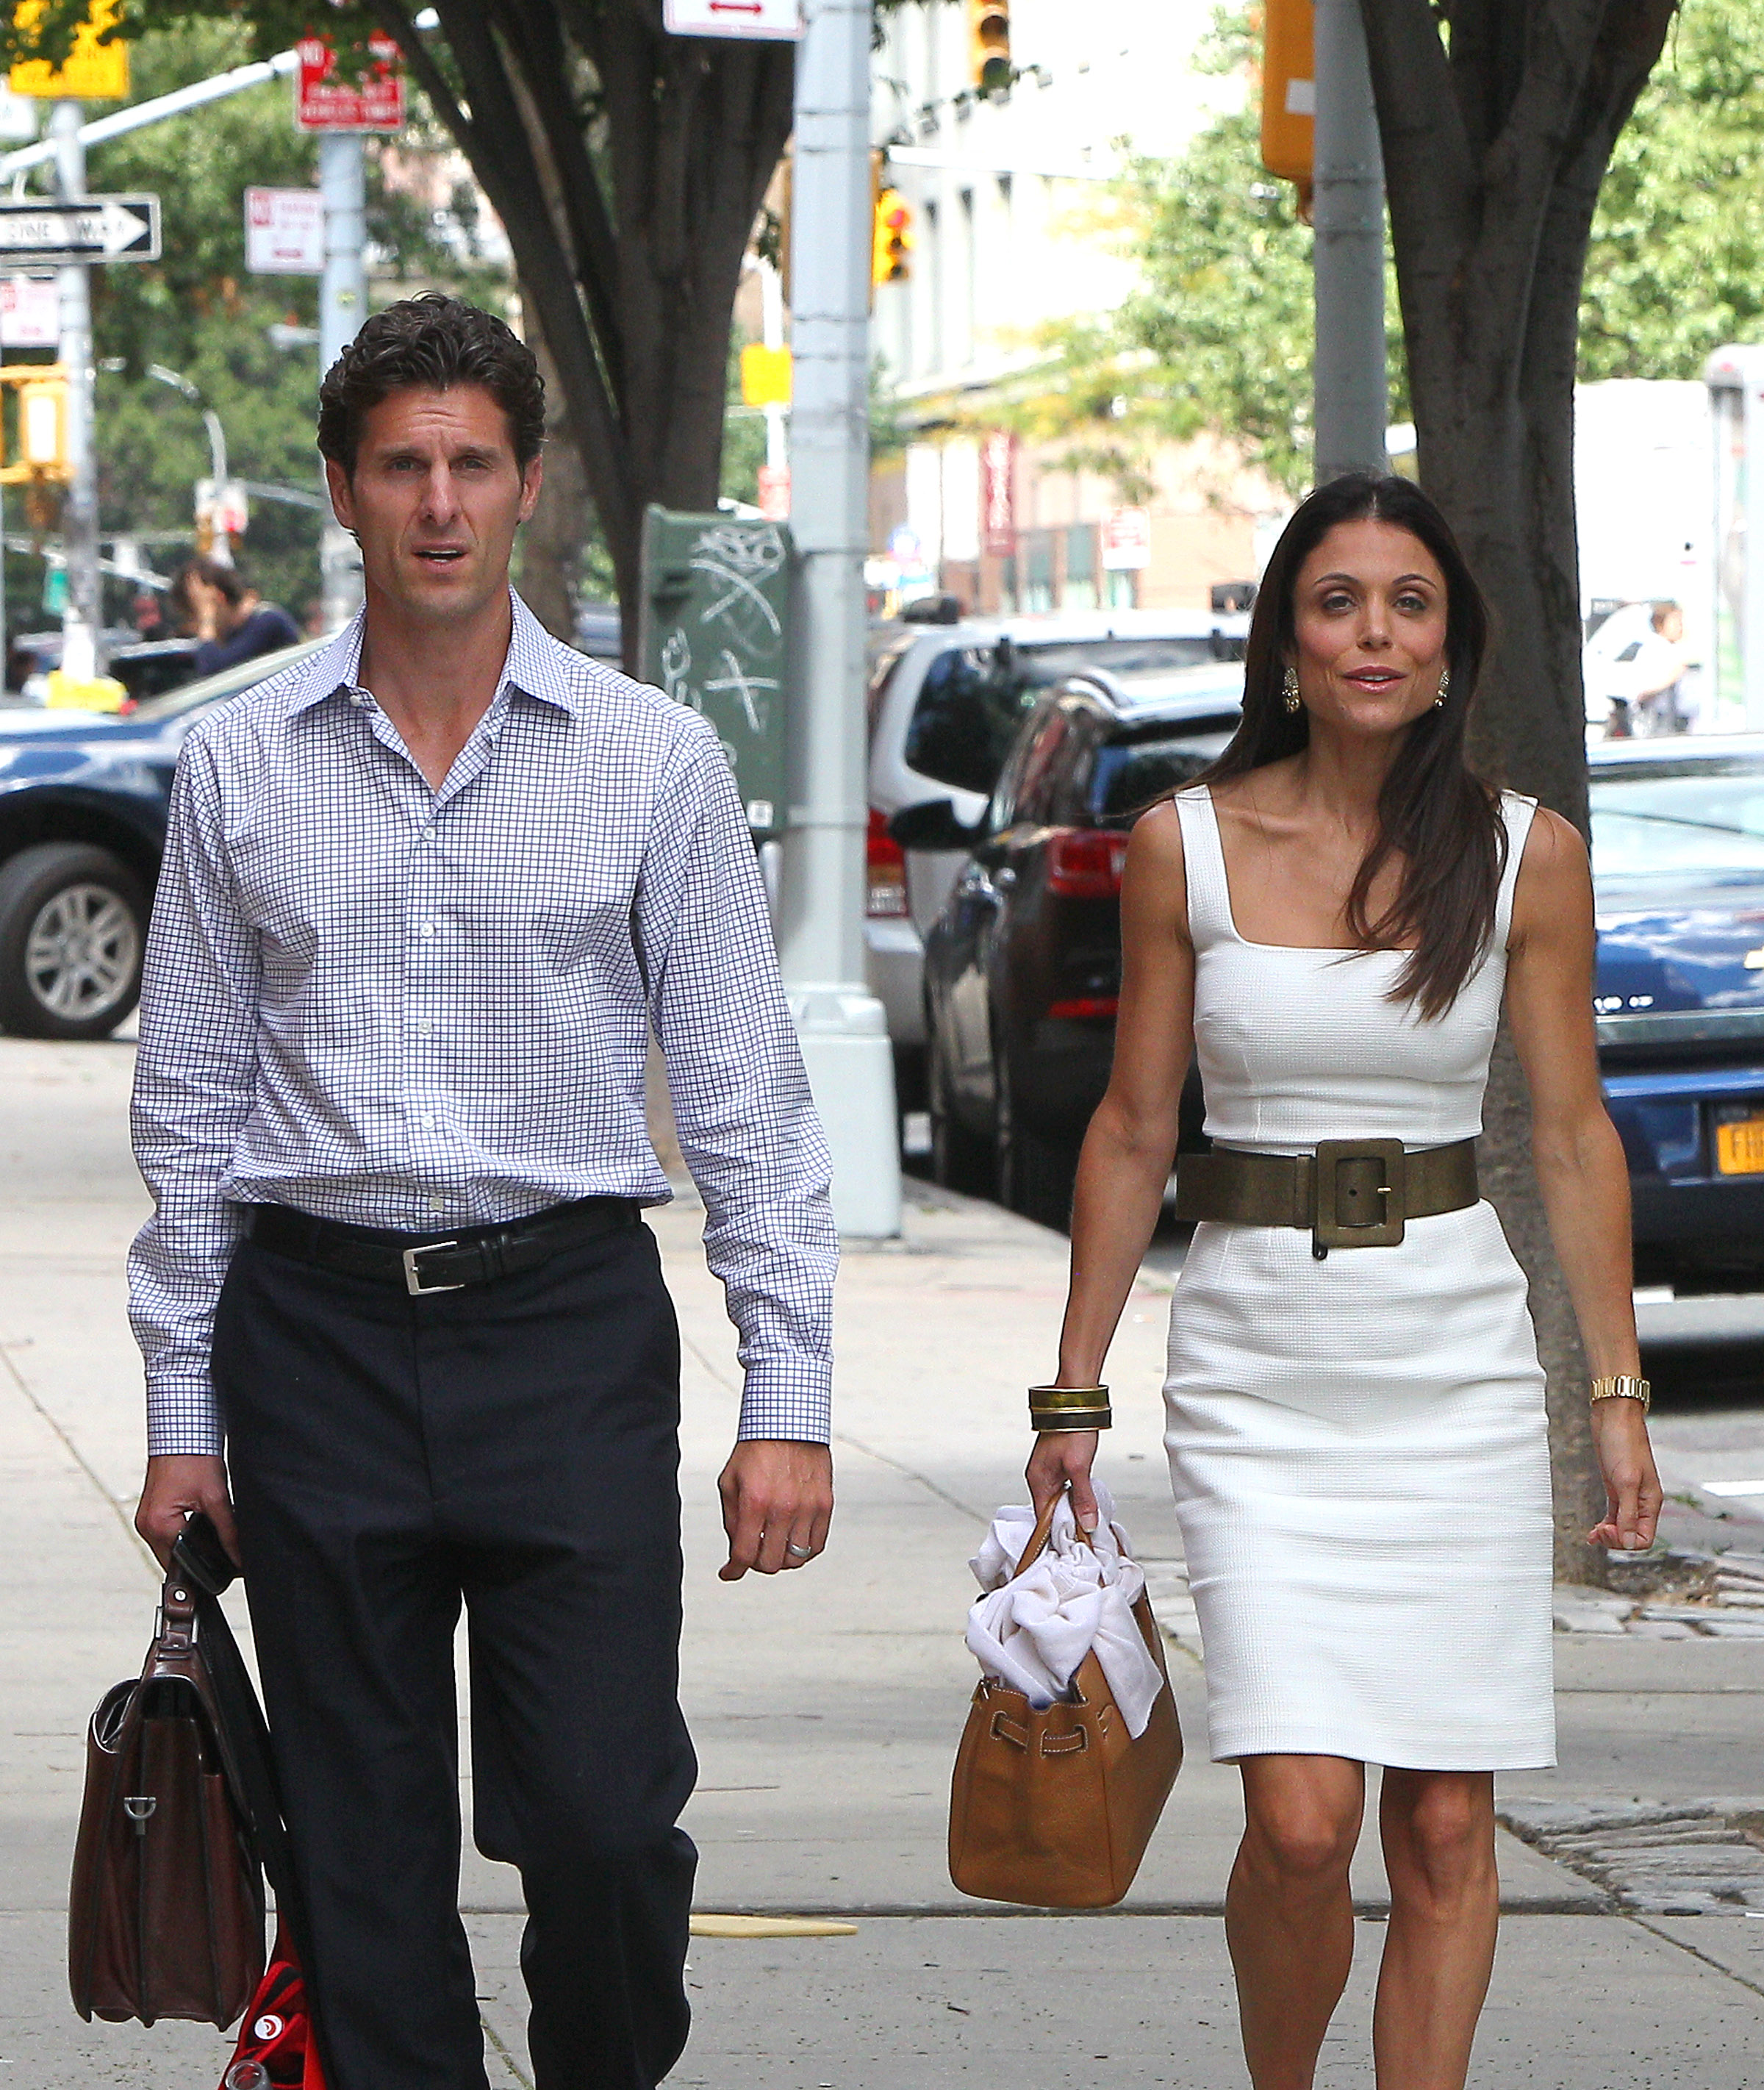 Bethenny Frankel and husband Jason Hoppy walking in NYC